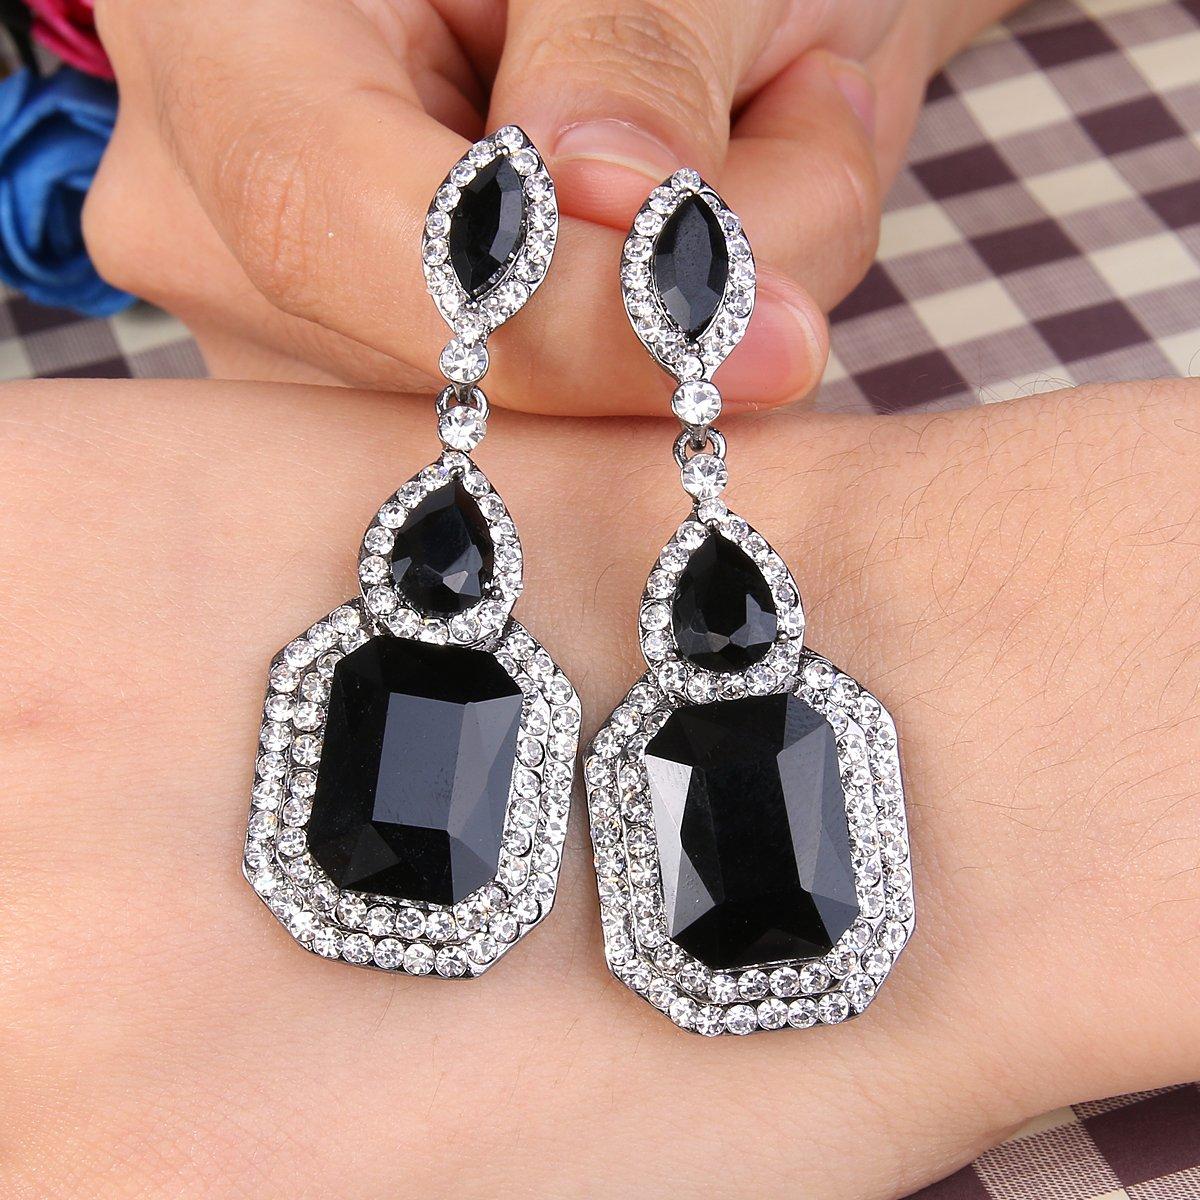 8bc7b9b81 Amazon.com: BriLove Wedding Bridal Dangle Earrings for Women Emerald Cut  Crystal Infinity Figure 8 Chandelier Earrings Black/Clear Black-Silver-Tone:  ...